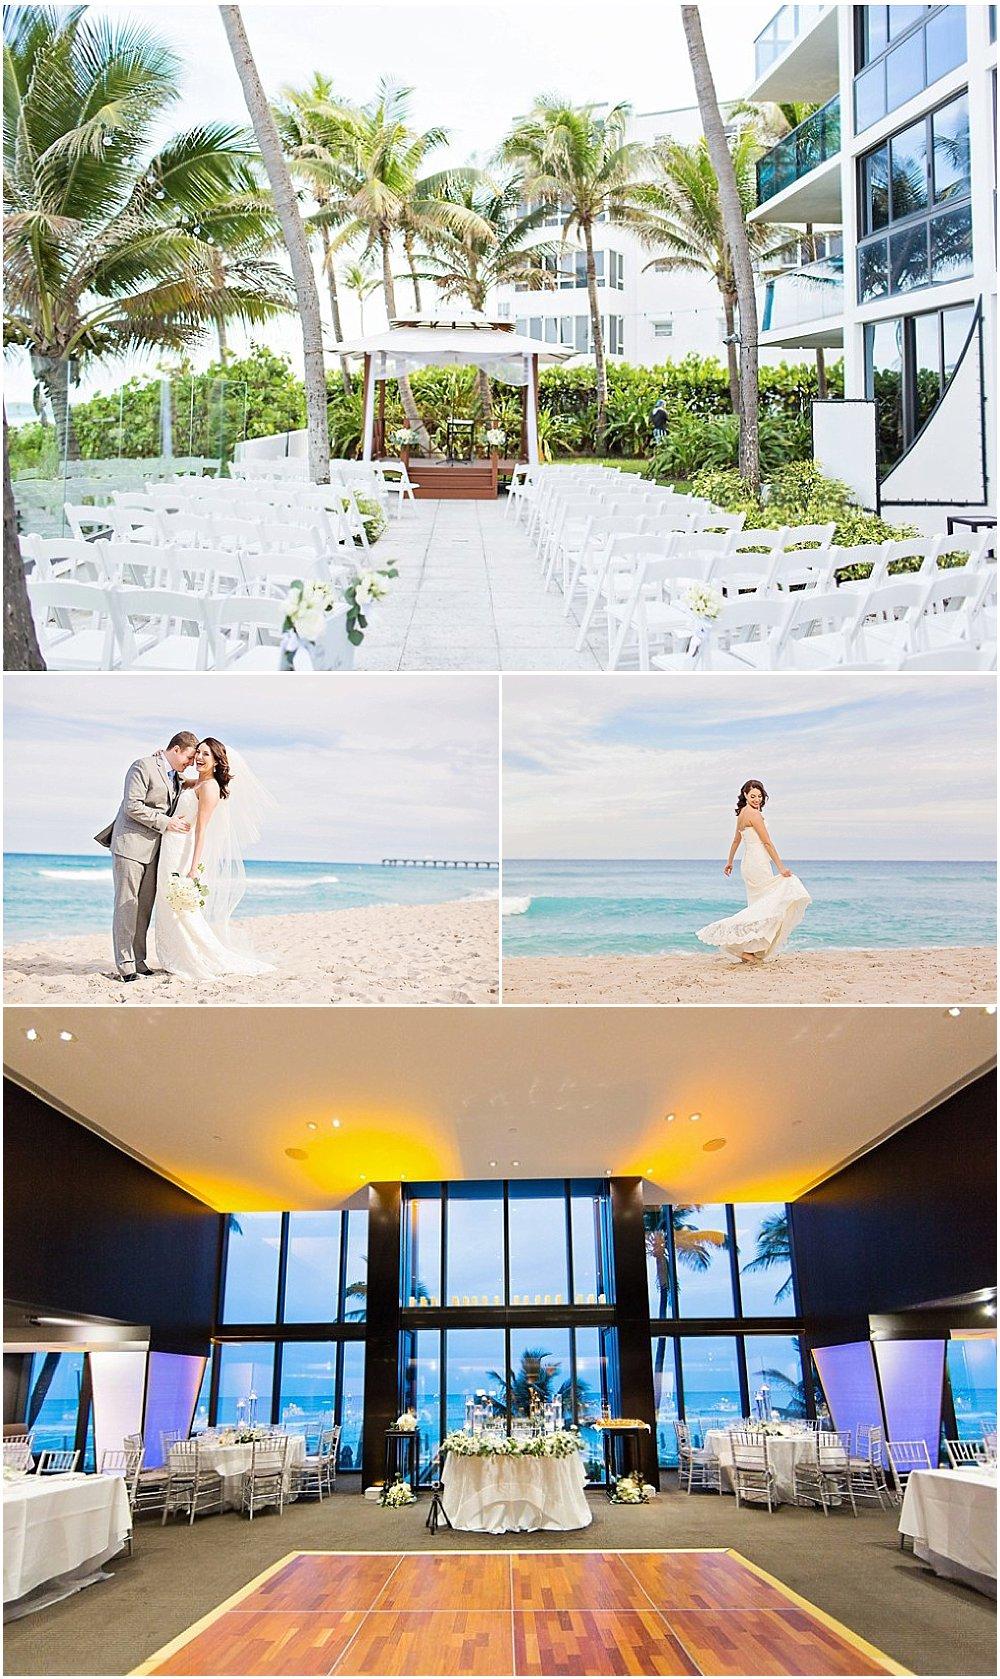 Beach Wedding Venue_Thompson Photography Group